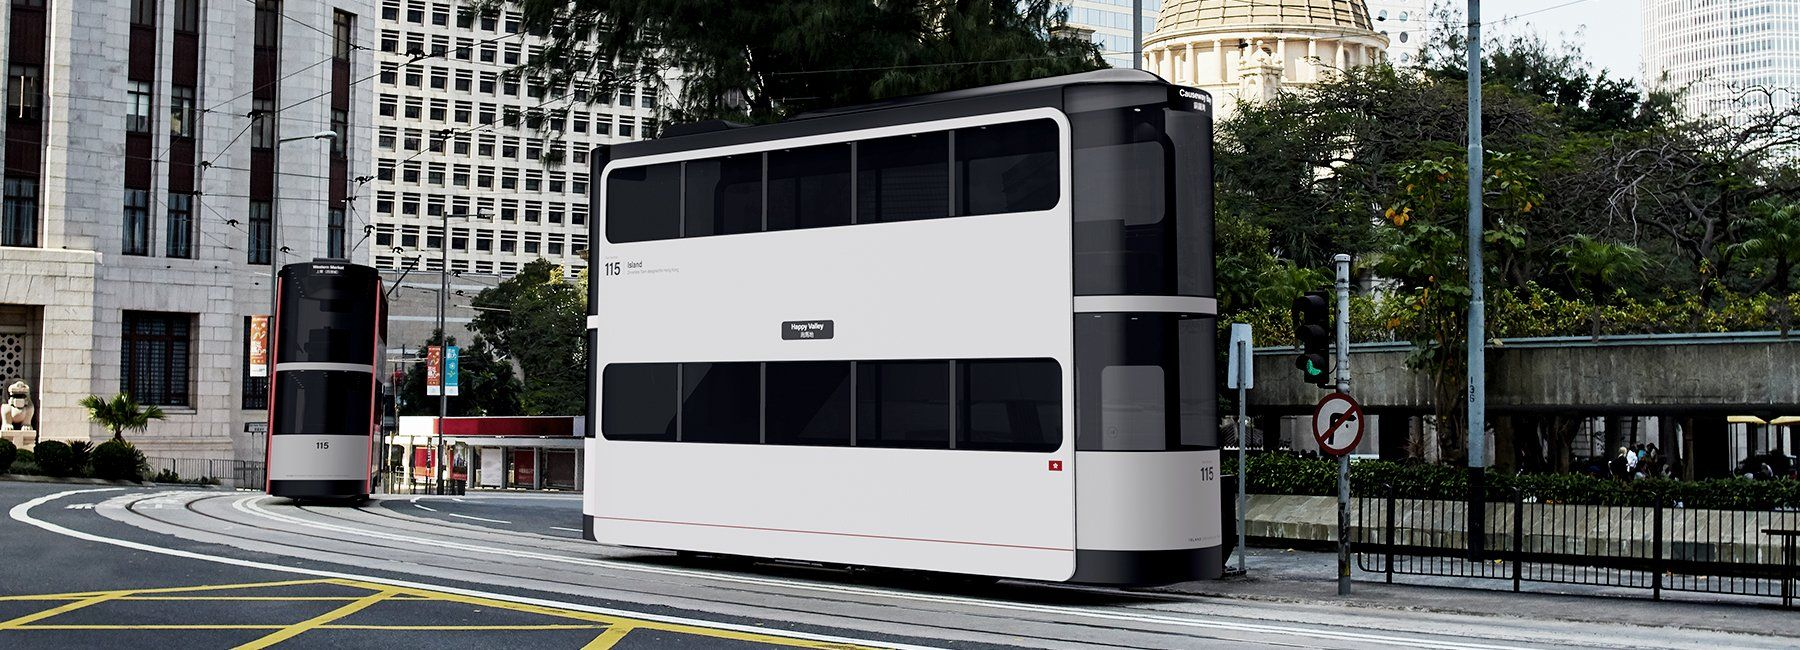 'island' is a driverless socialdistancing tram designed